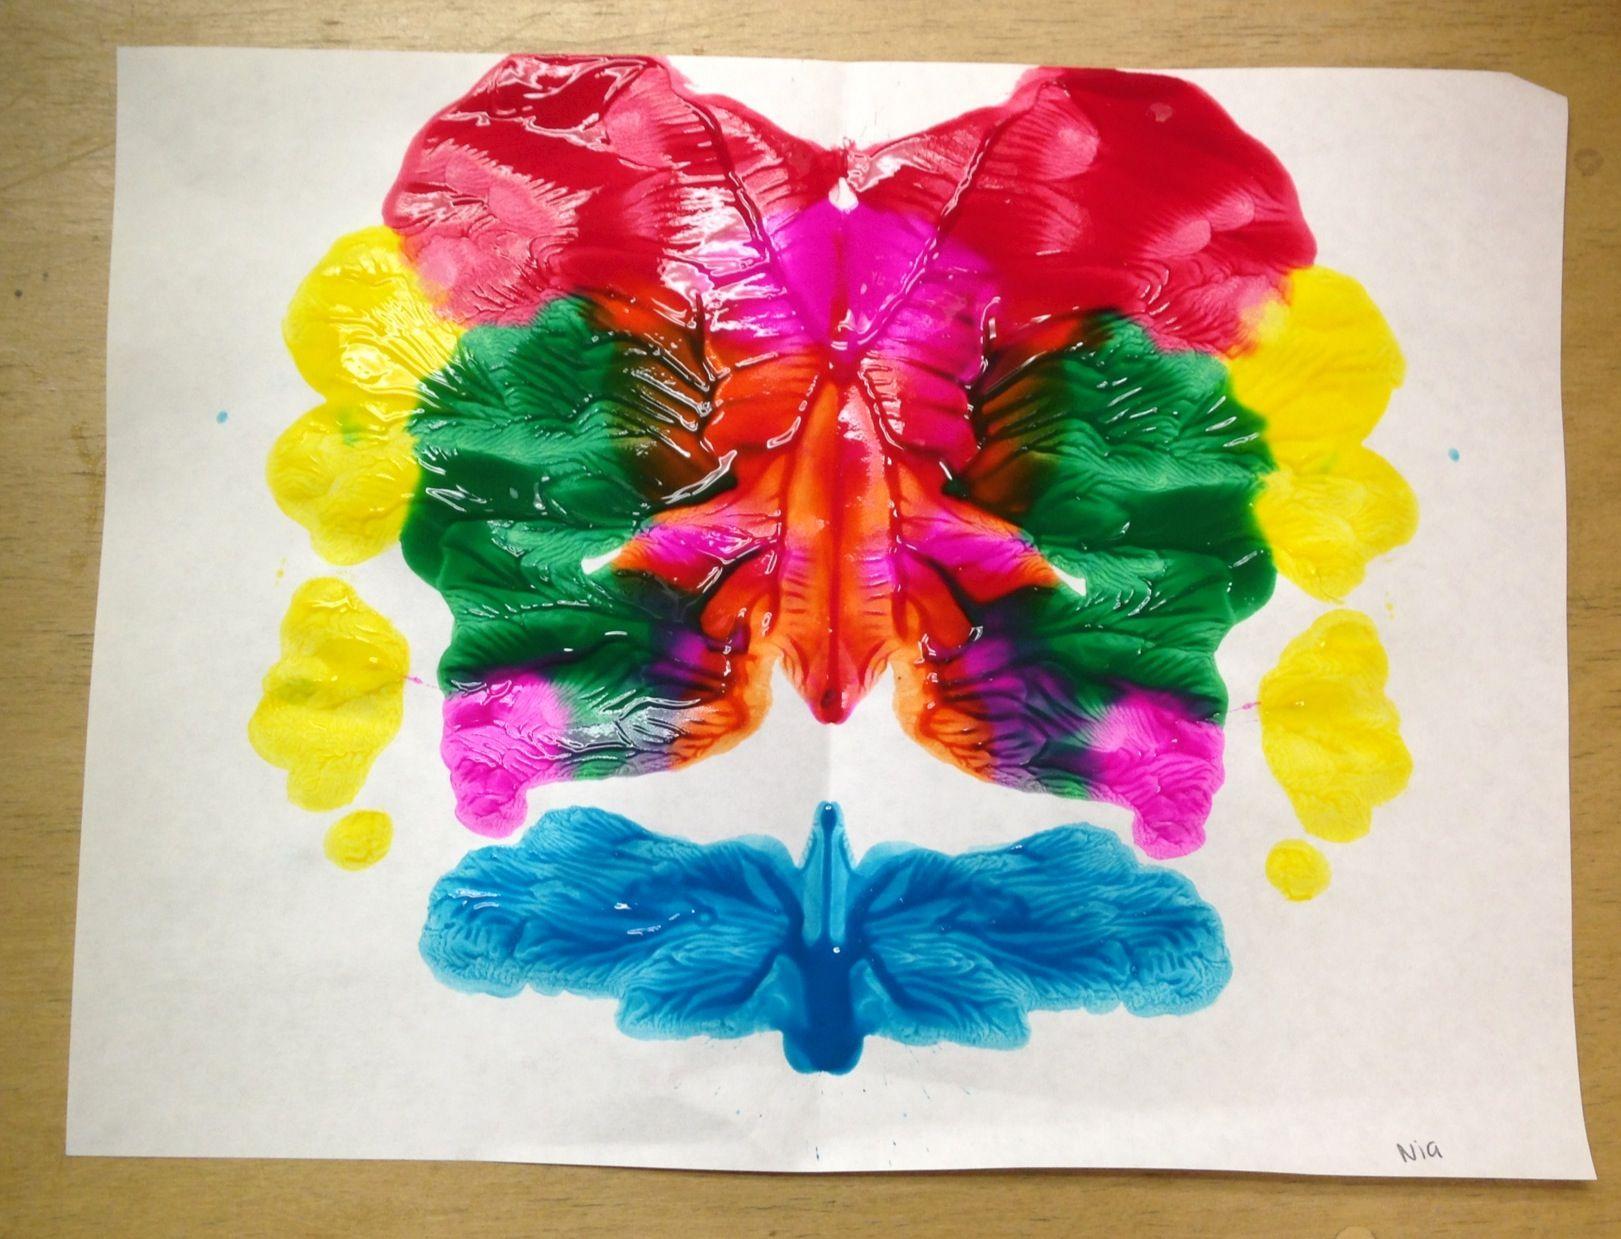 Abstract Prints In Preschool 2